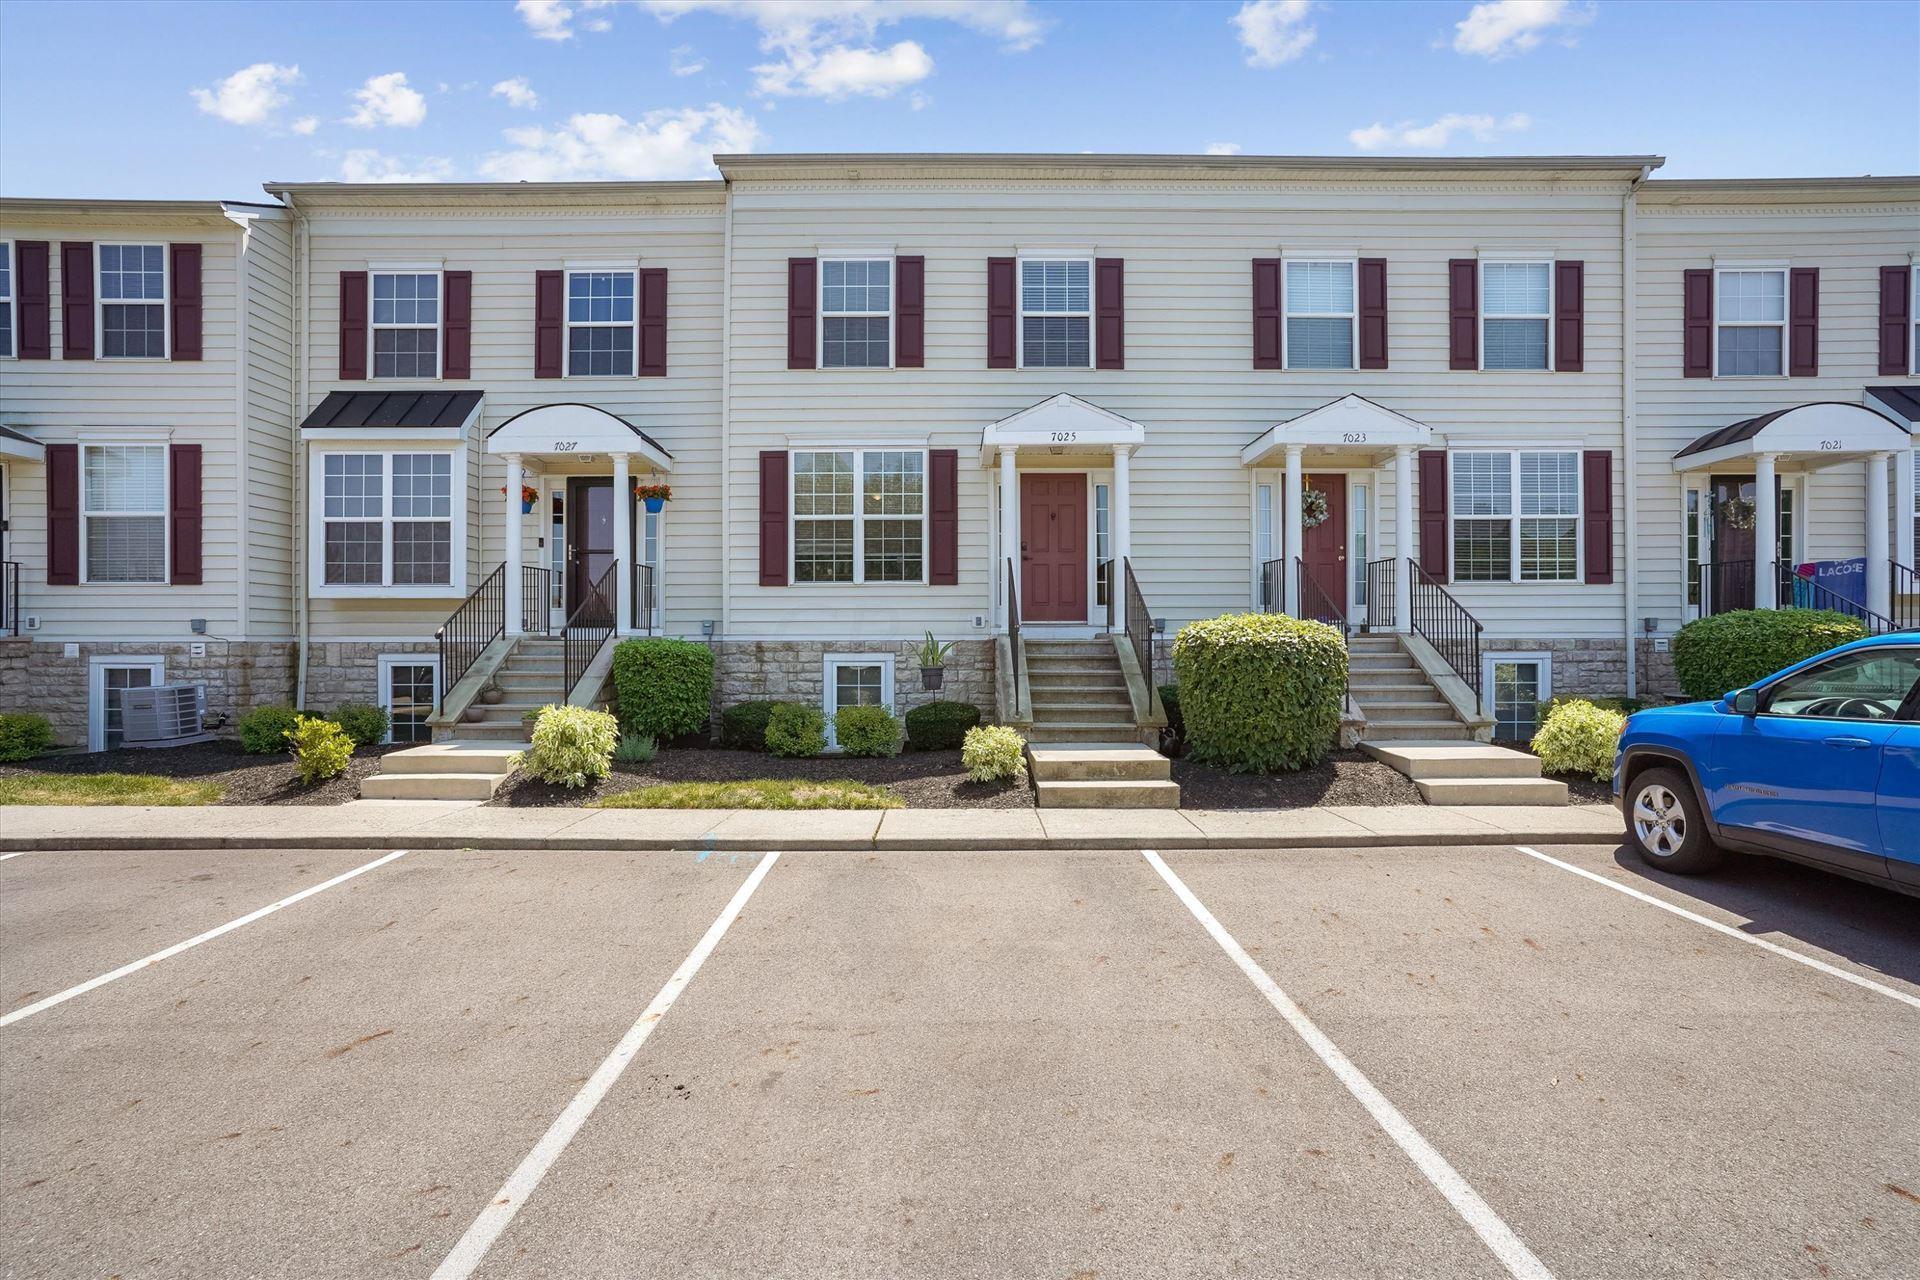 Photo of 7025 Pleasant Colony Way #15-702, New Albany, OH 43054 (MLS # 221028232)